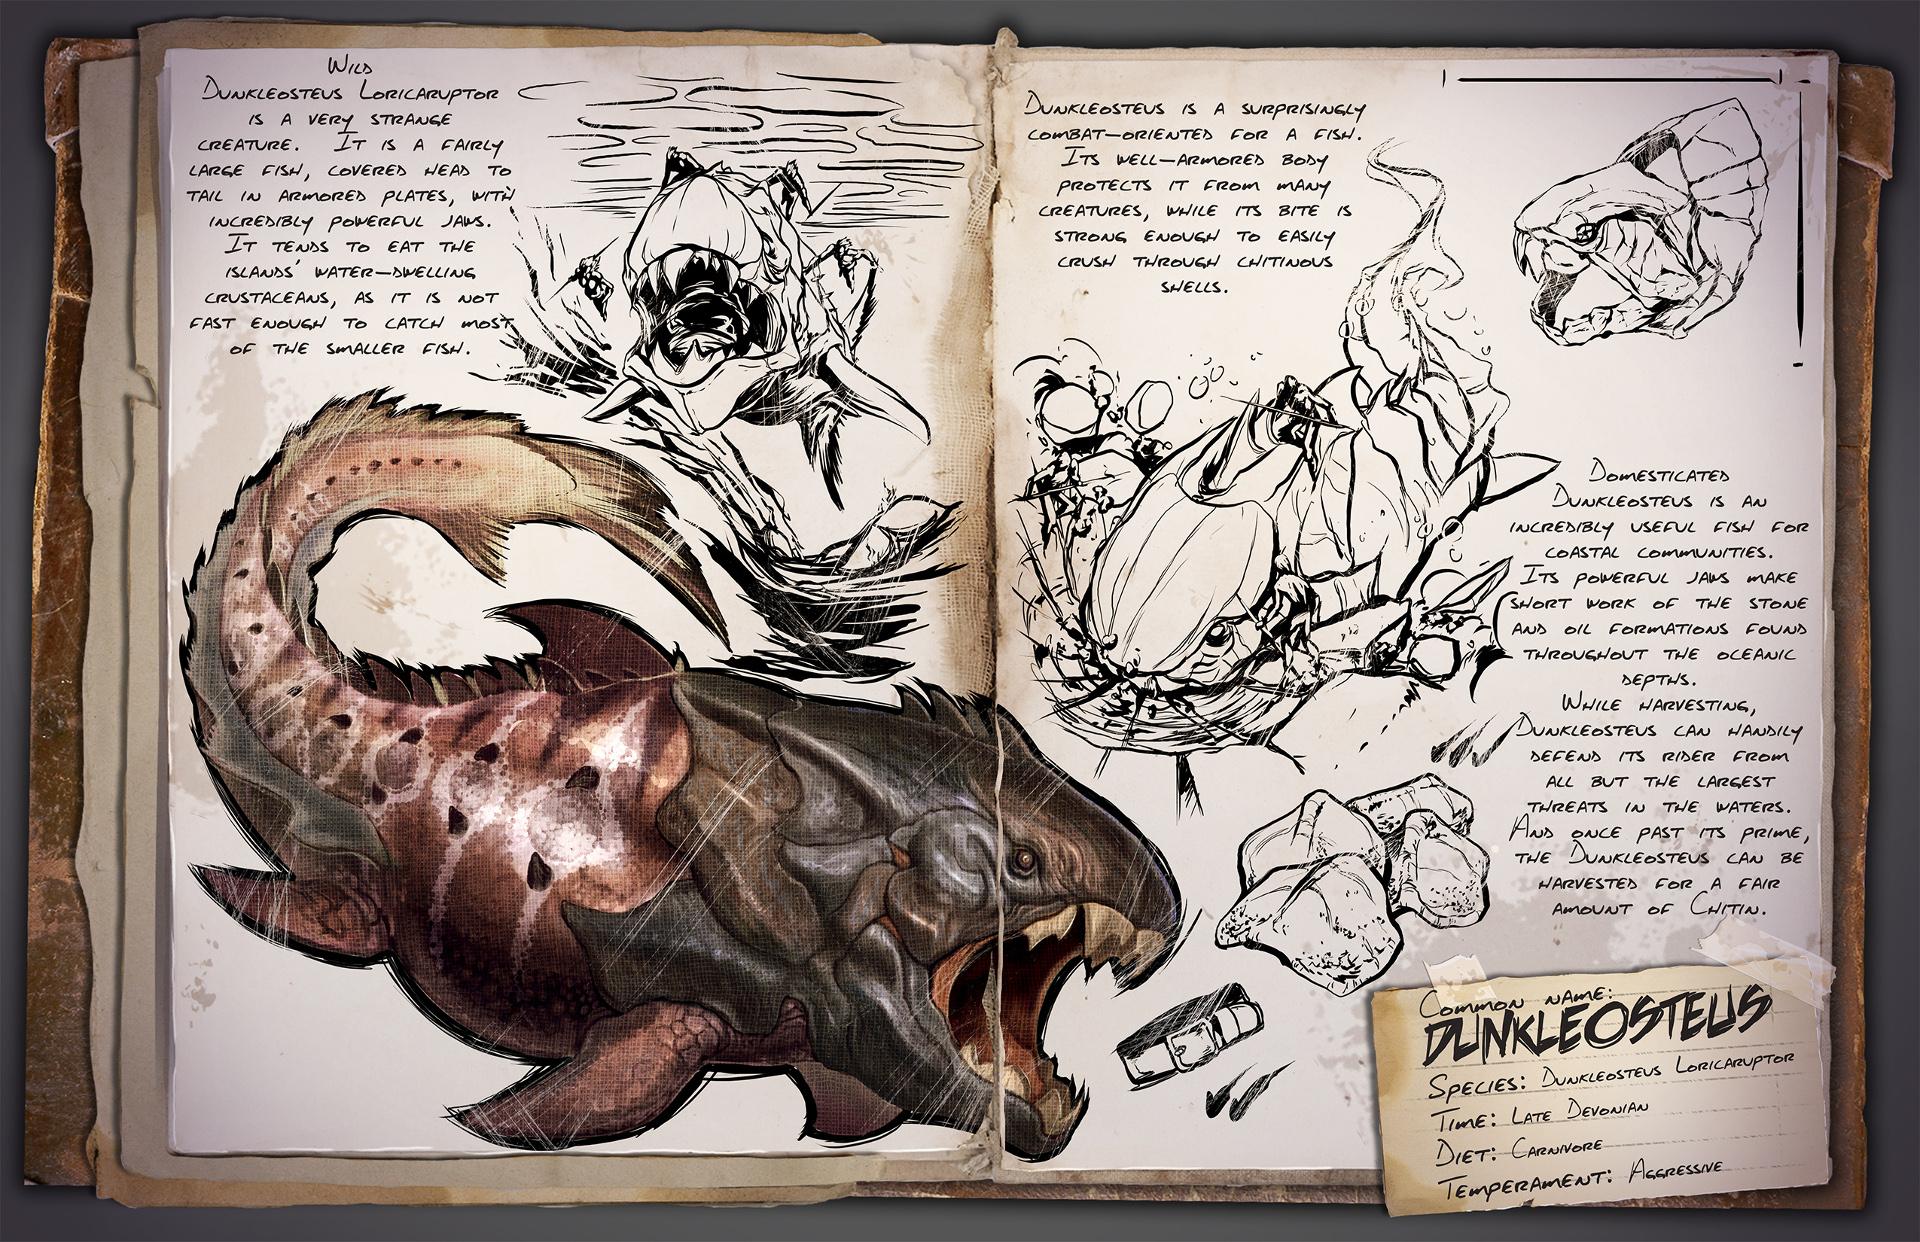 Dino Dossiê: Dunkleosteus Loricaruptor